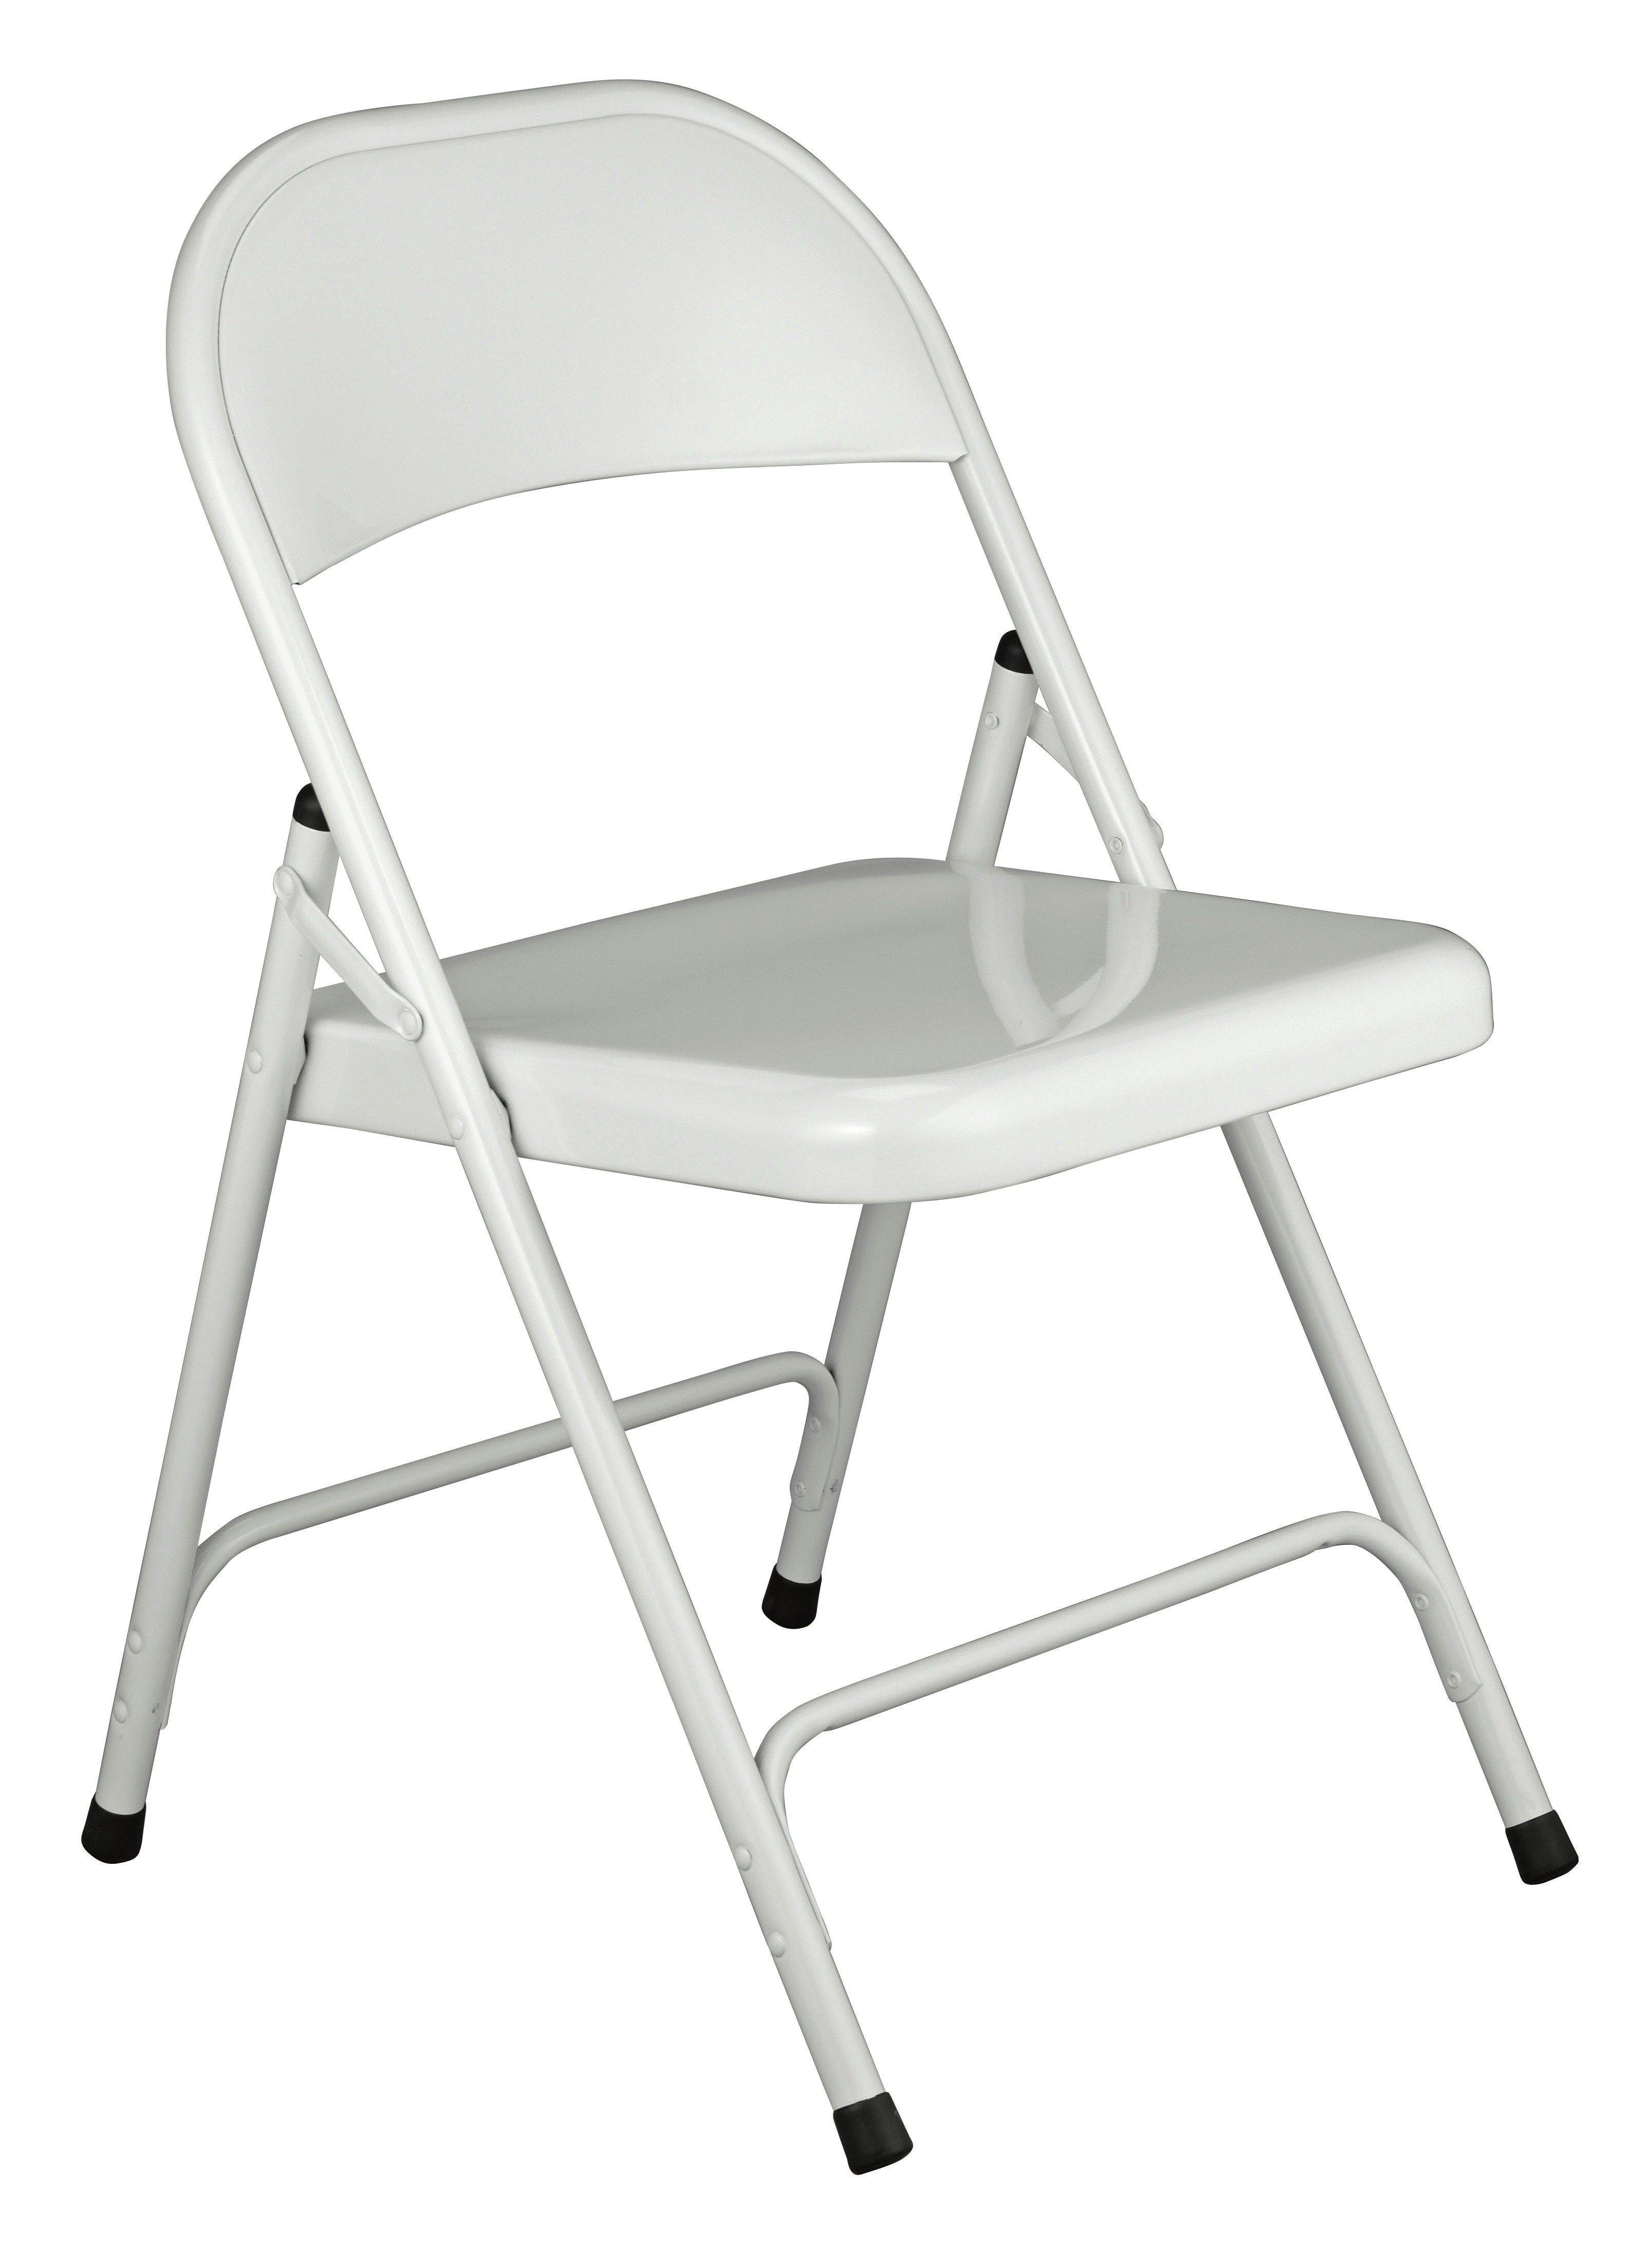 Habitat Macadam Metal Folding Chair   White